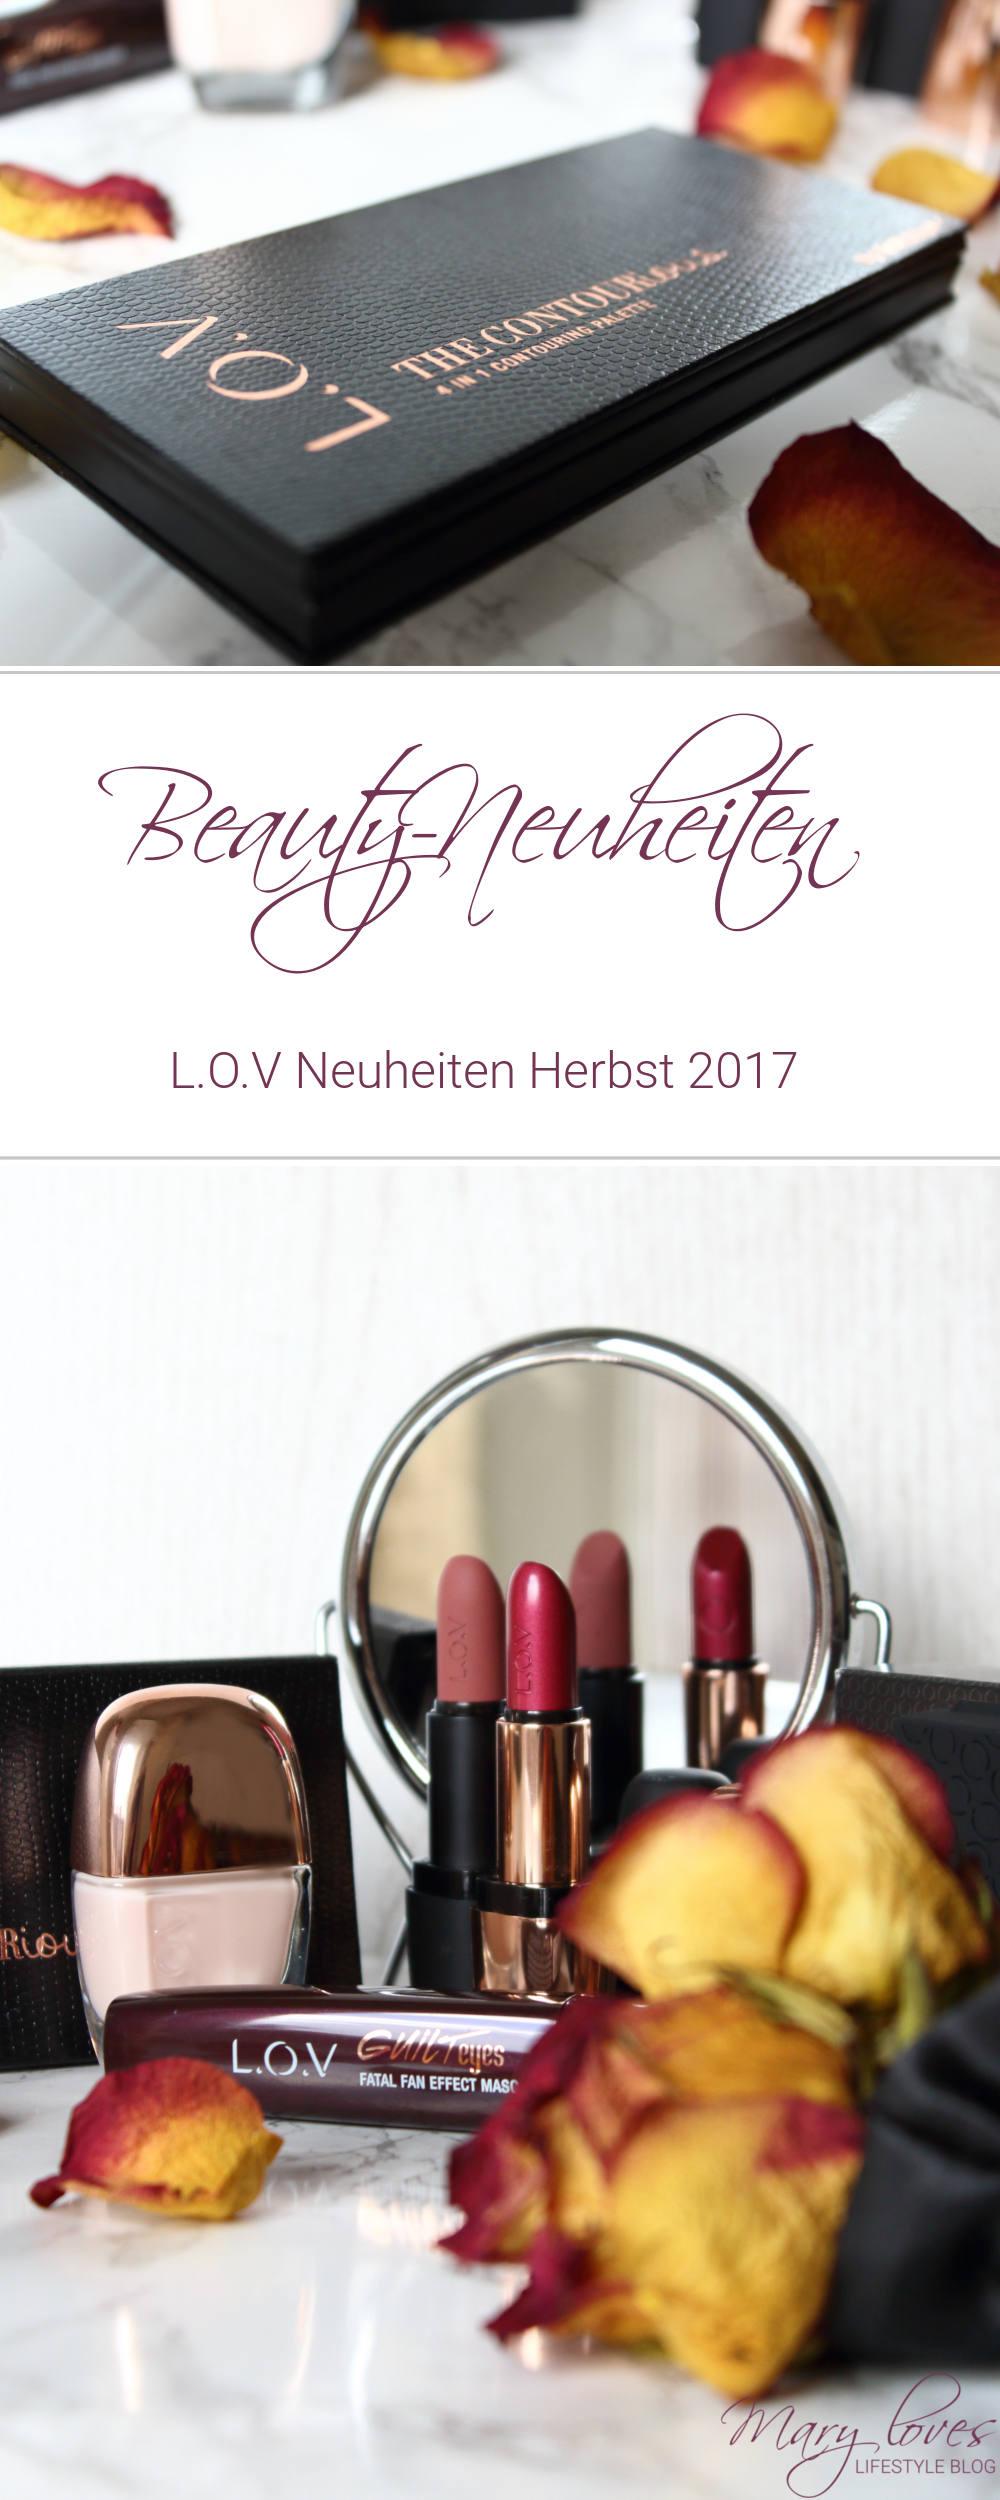 [Anzeige - Produktplatzierung] L.O.V Neuheiten Herbst 2017 - Beauty-News - Make-up #makeup #lov #thenewlov